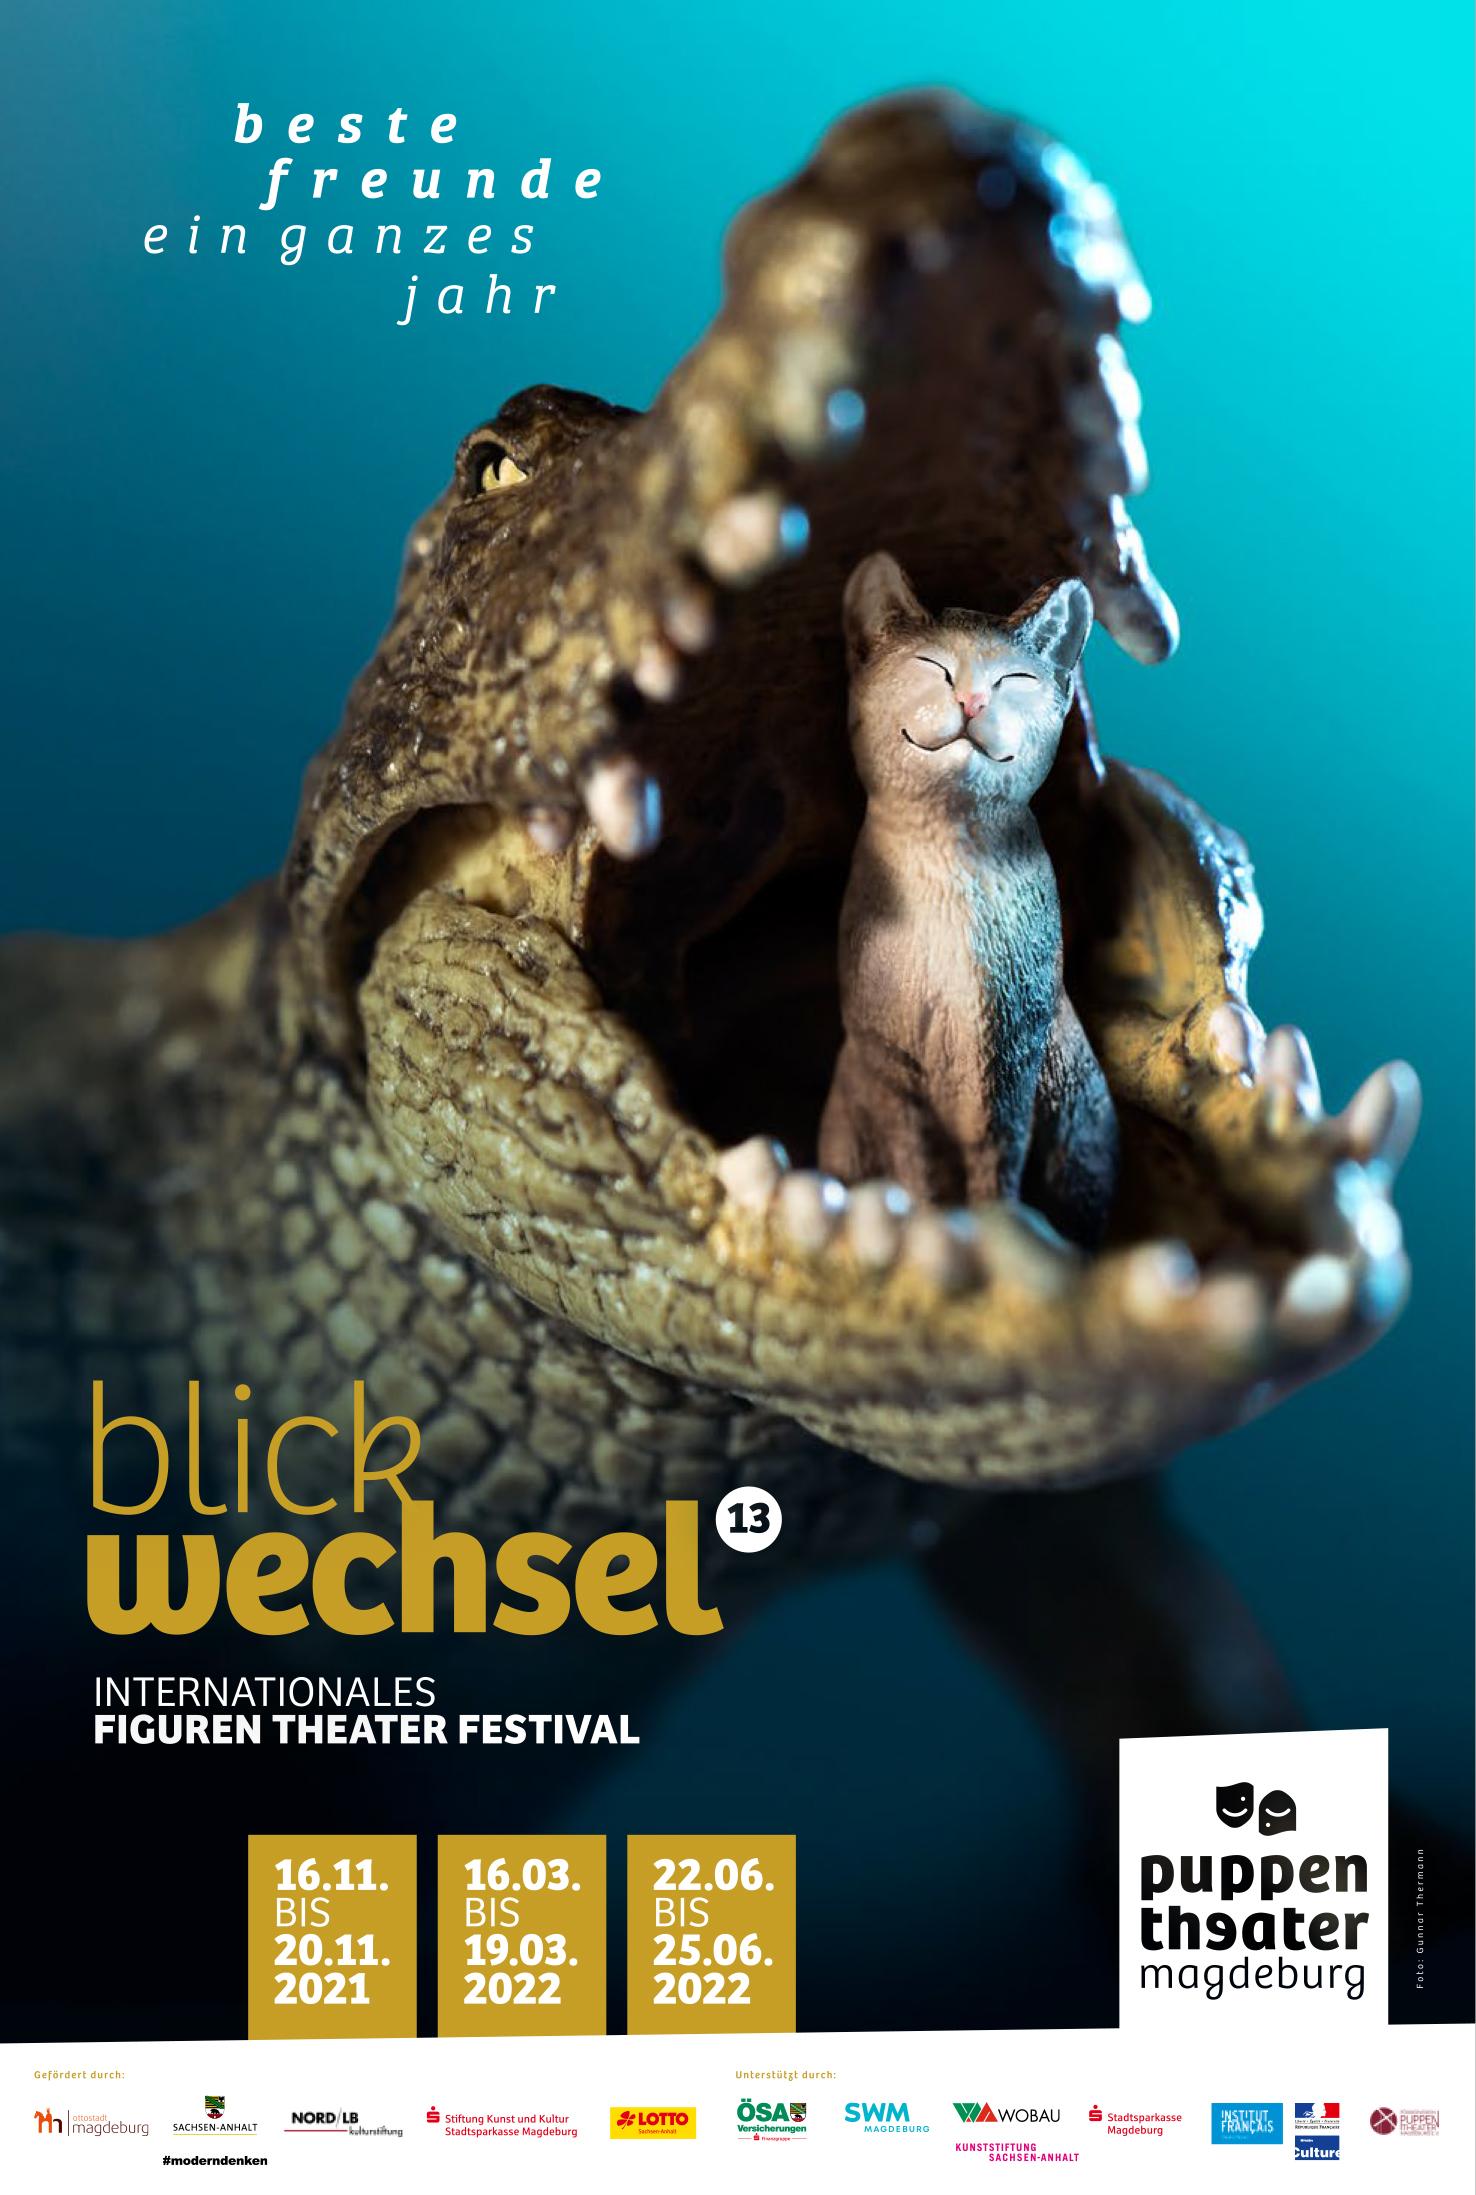 Internationales Figurentheaterfestival Blickwechsel 2021